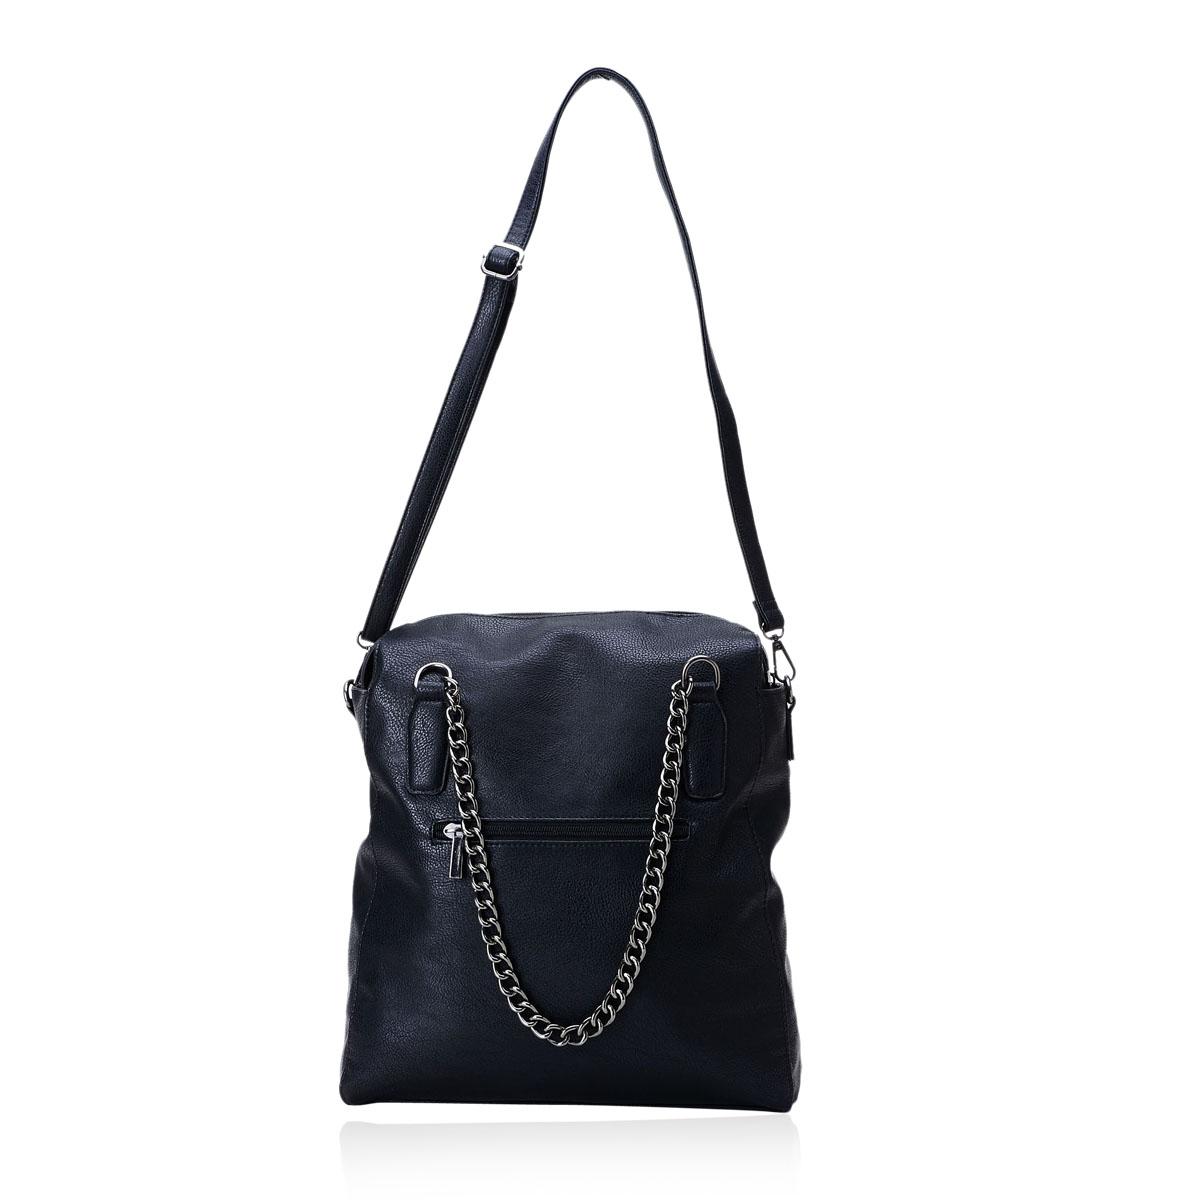 Black Faux Leather Shoulder Bag (12x5x12 in)